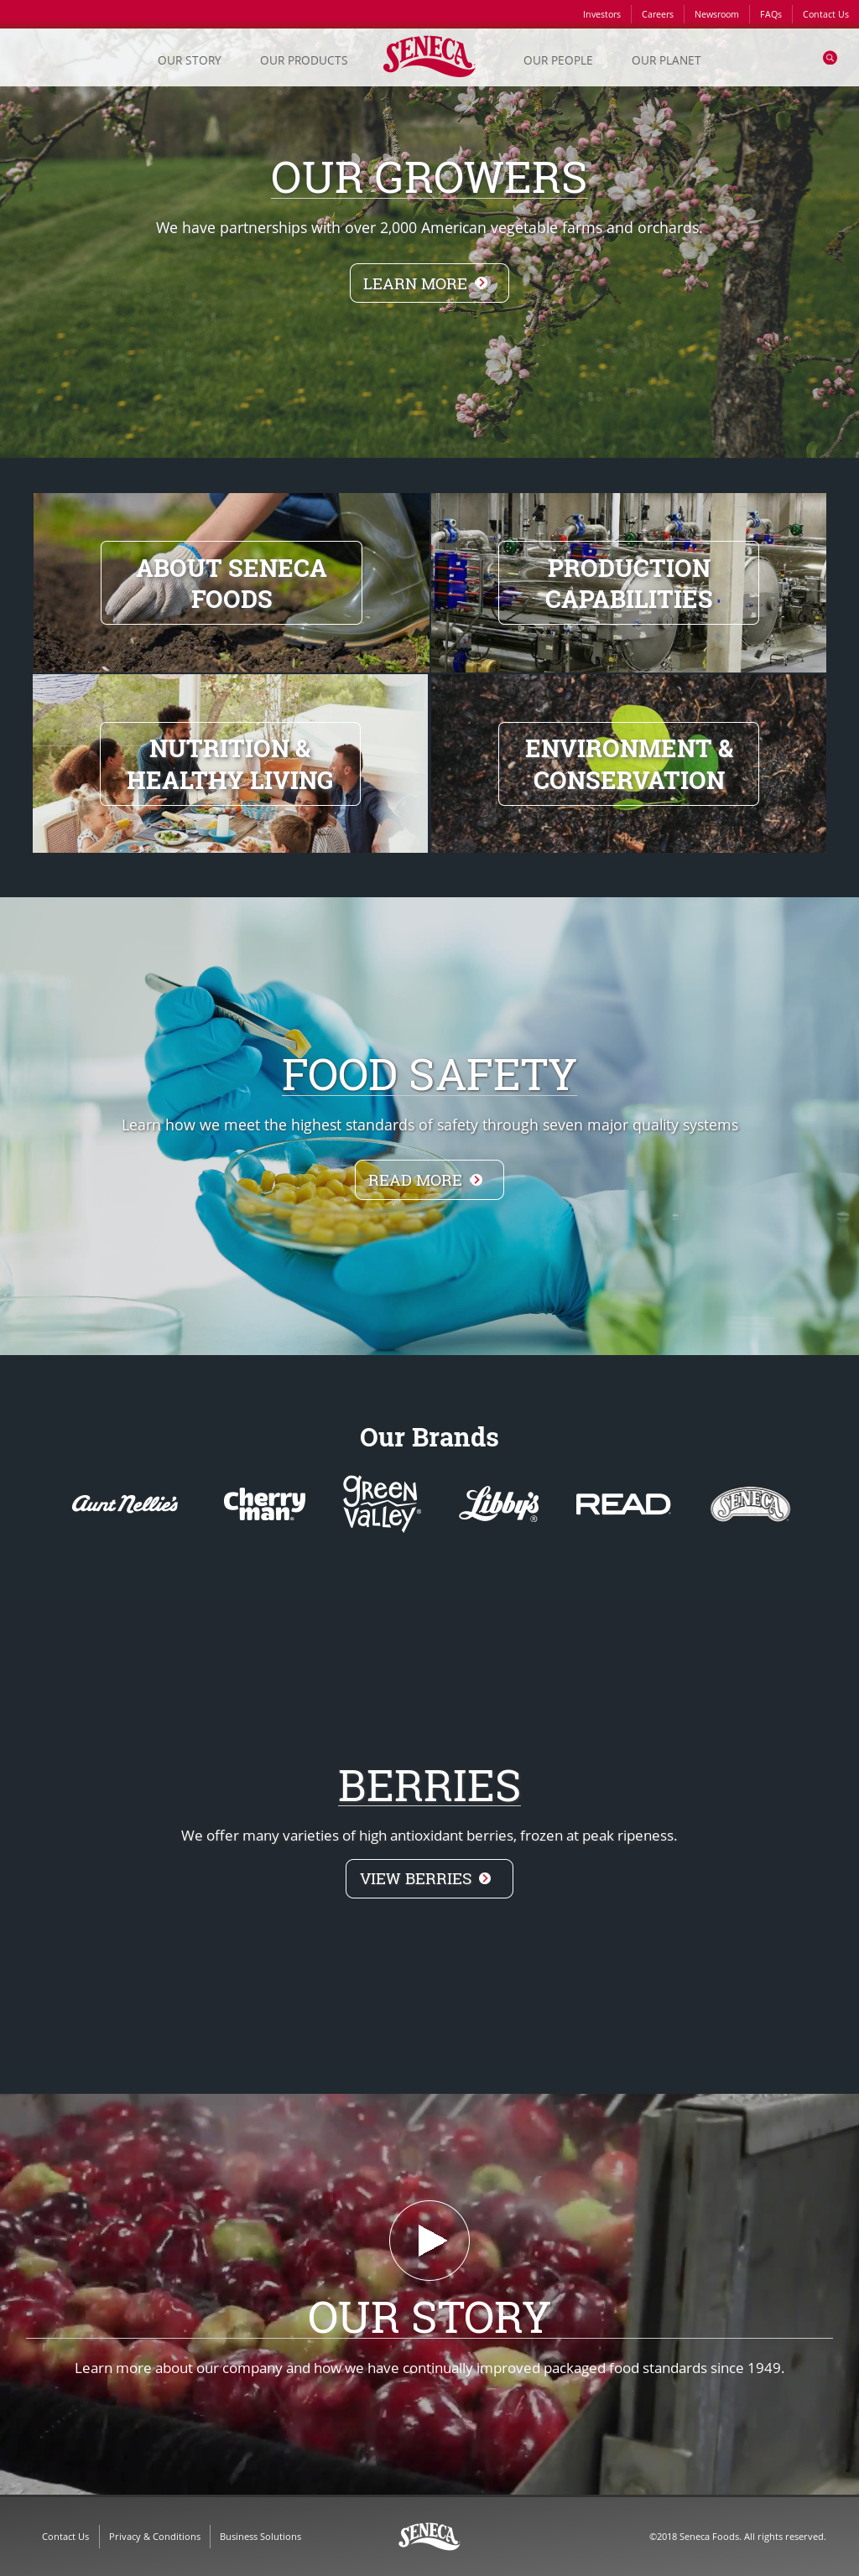 Seneca Foods Corporation New York